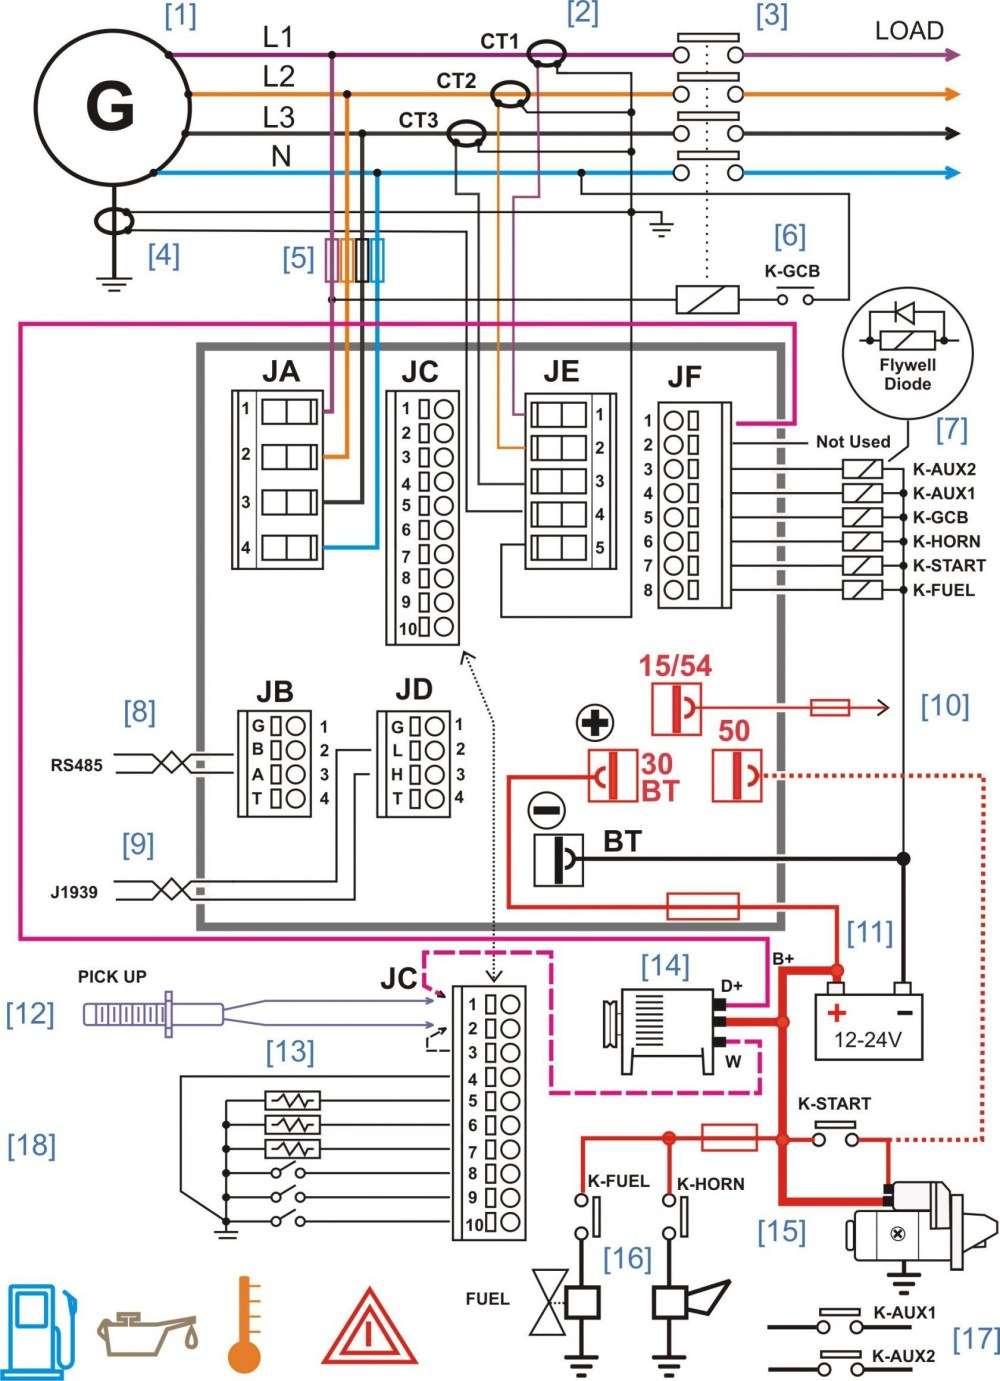 medium resolution of free wiring diagram weebly wiring library free wiring diagrams weebly audi q7